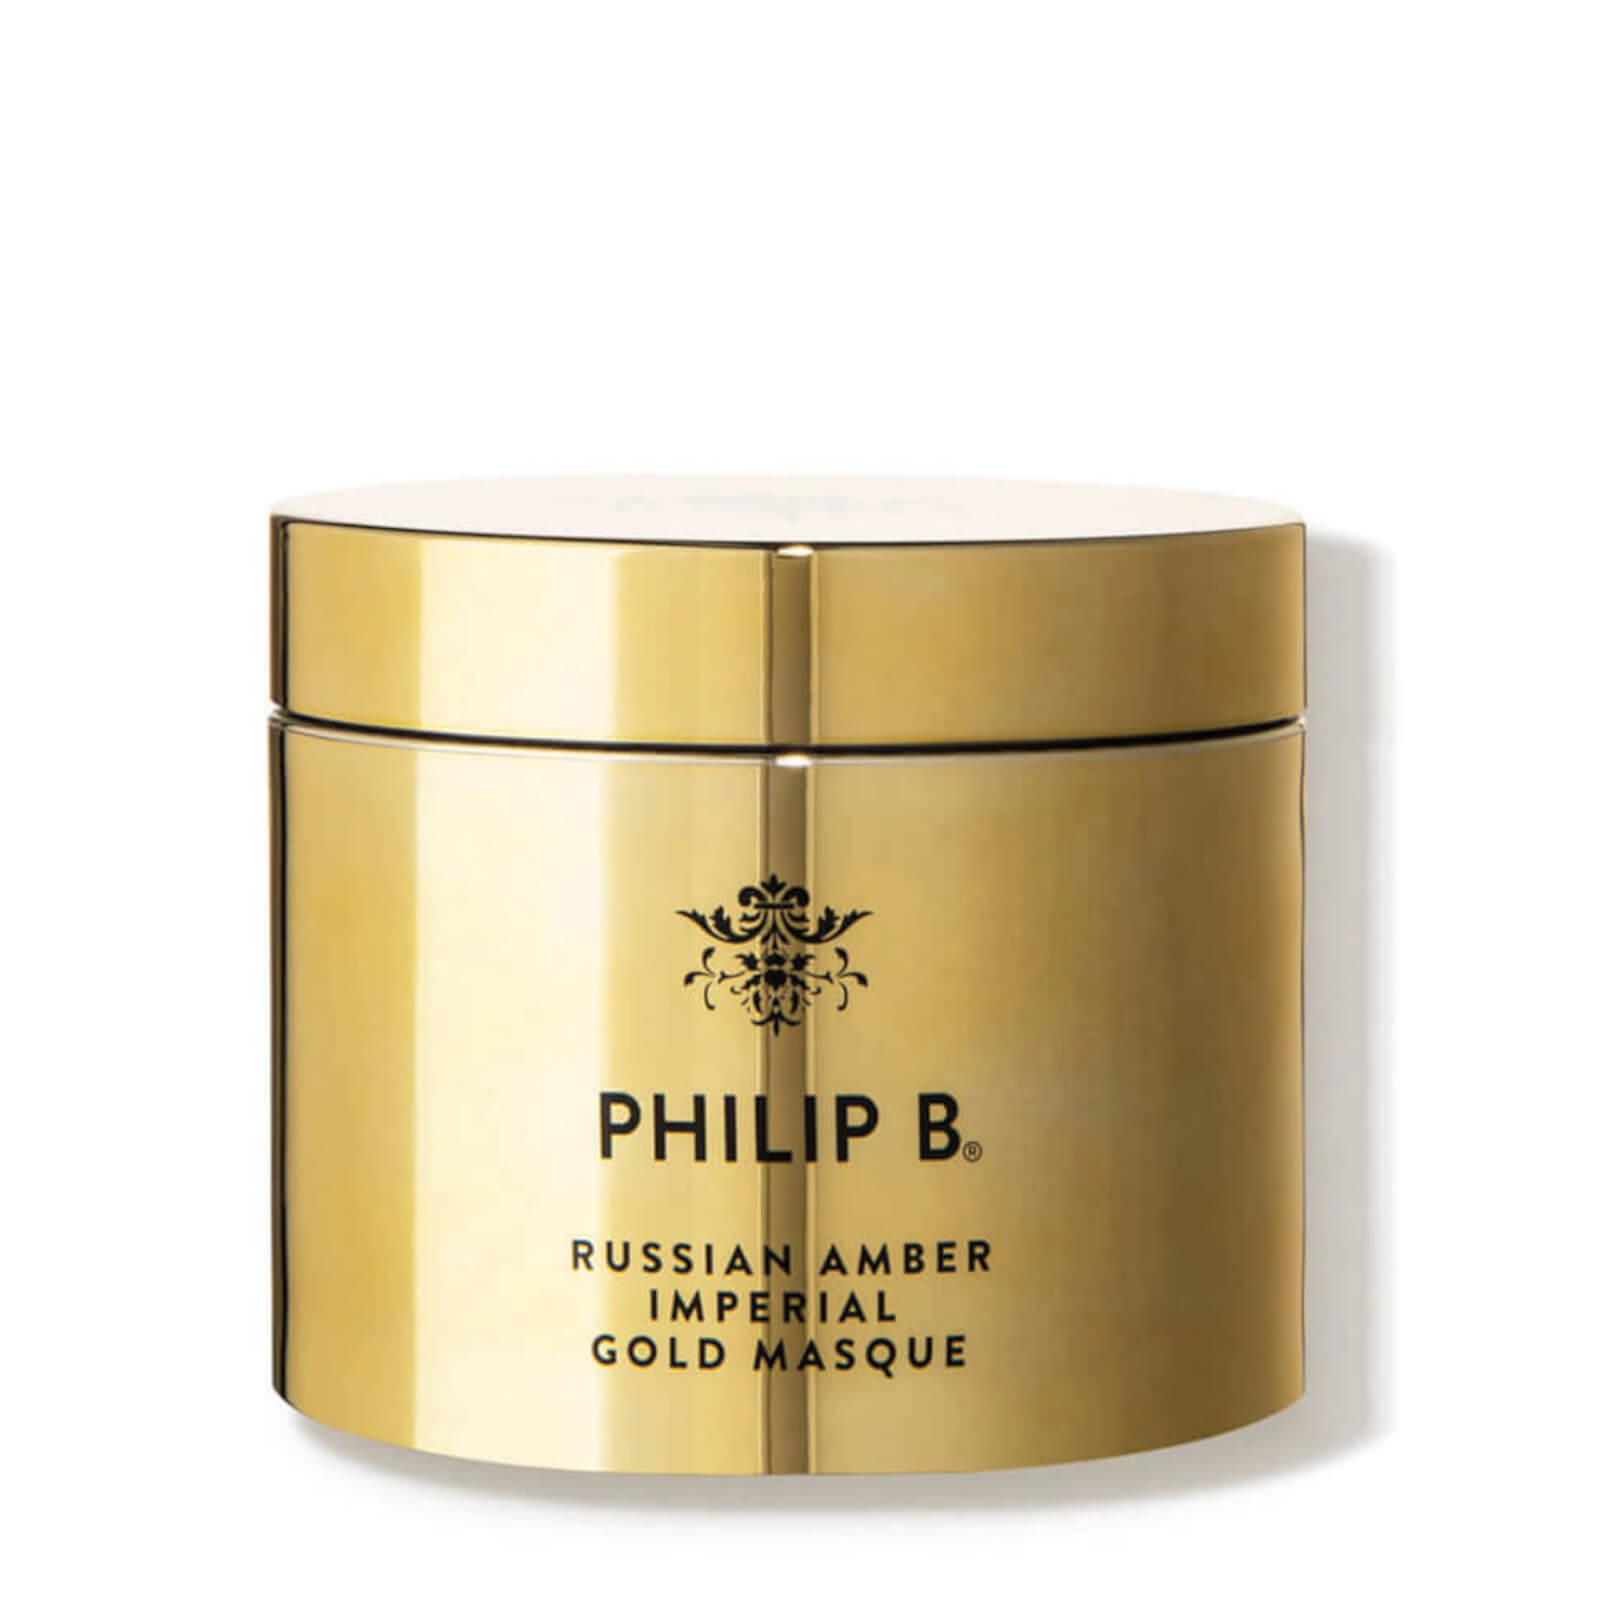 Купить Philip B Russian Amber Imperial Gold Masque 236ml